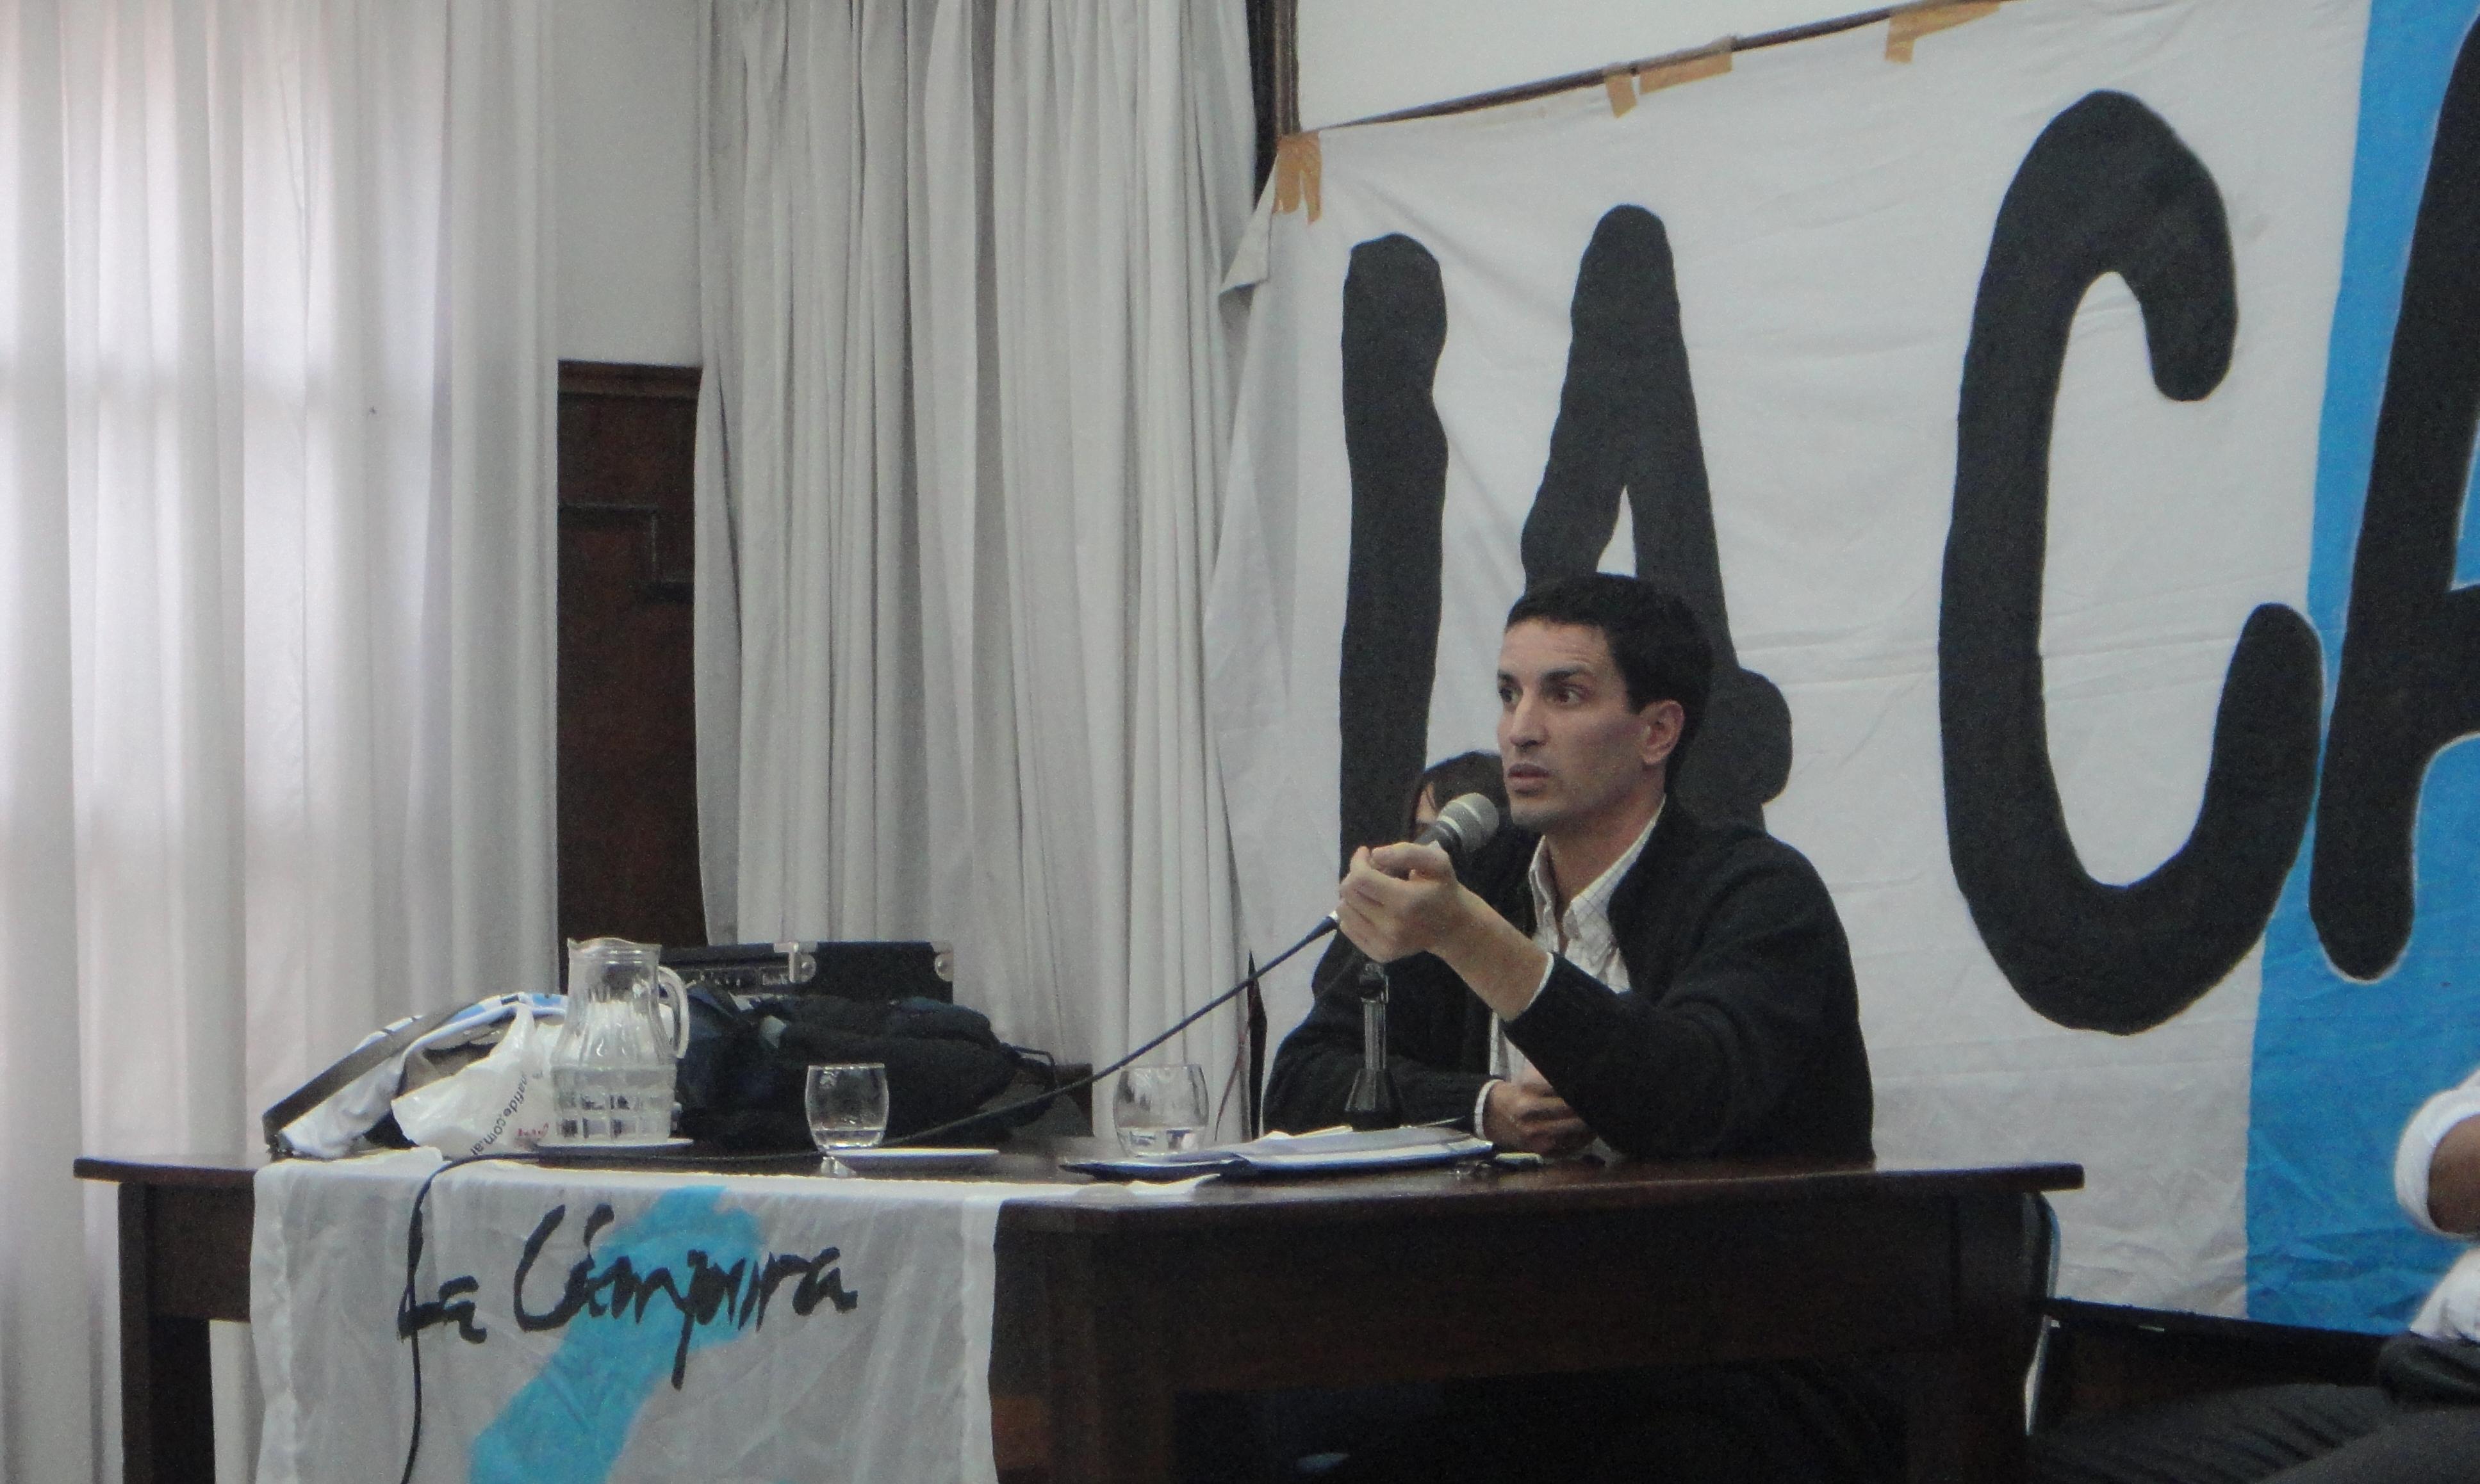 Charla Universidad en Jujuy